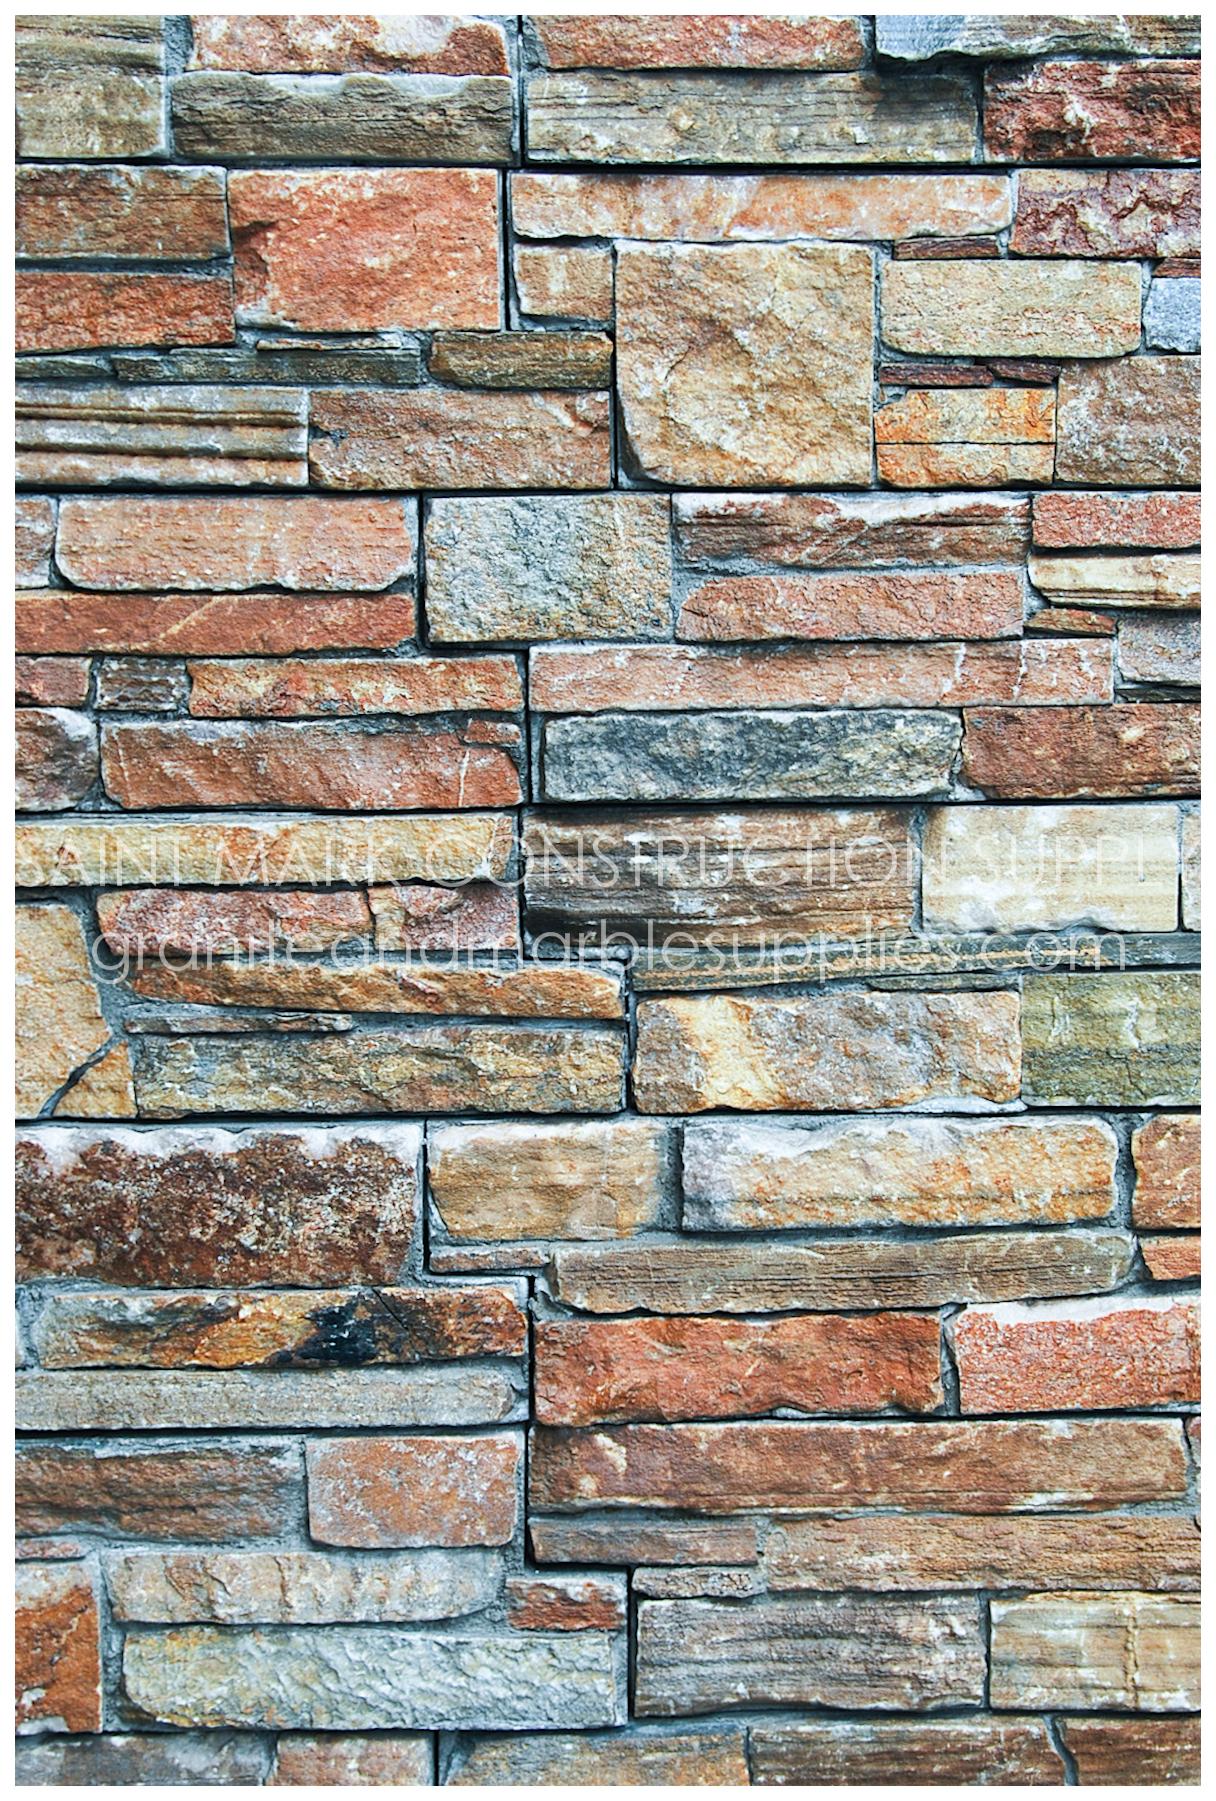 Decorative Natural Stones Saint Mark Construction Supply